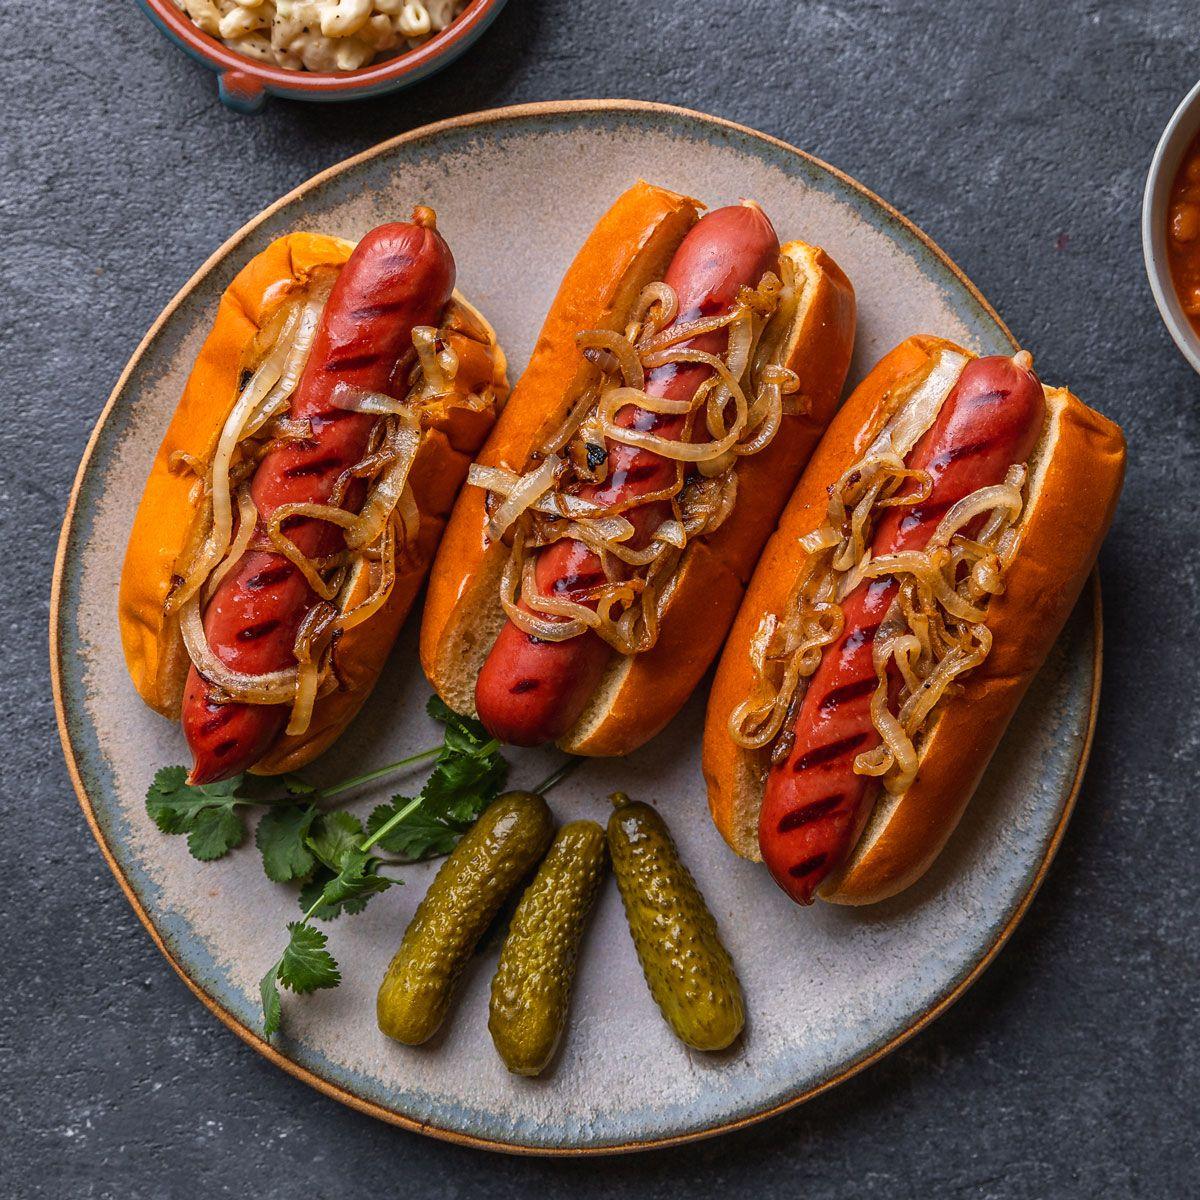 American Kobe Wagyu Gourmet Hot Dogs